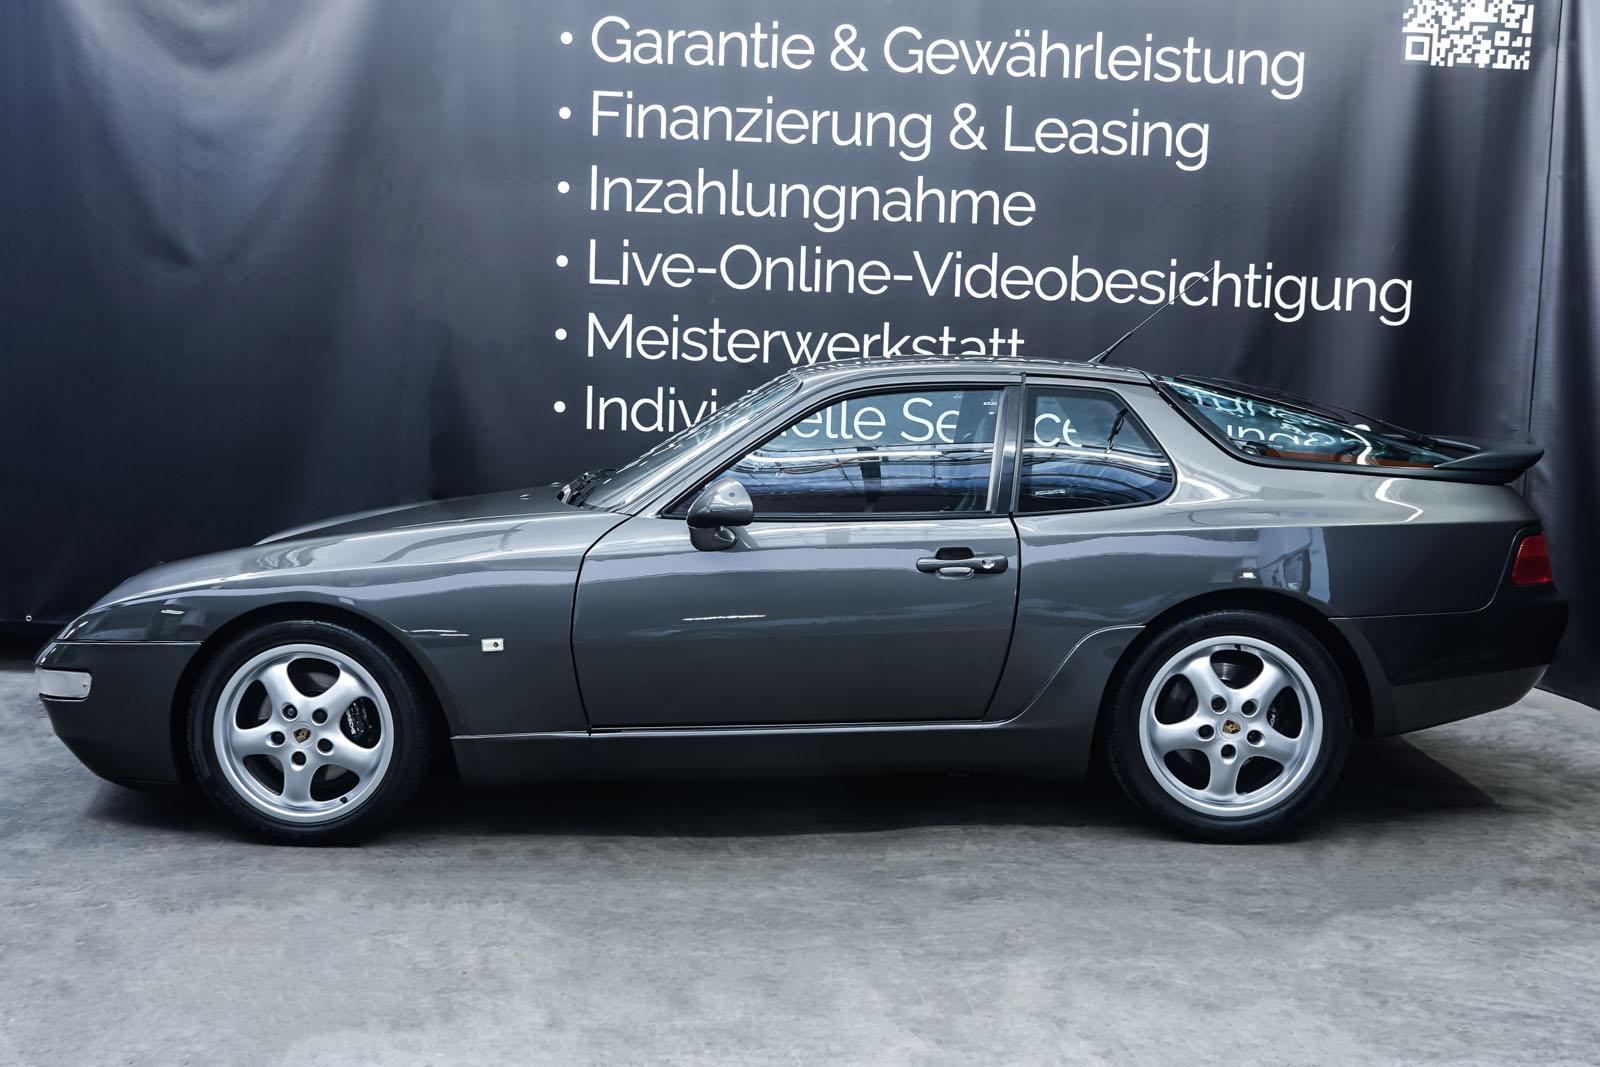 Porsche_986_Targa_Grau_Pink_POR-1092_5_w